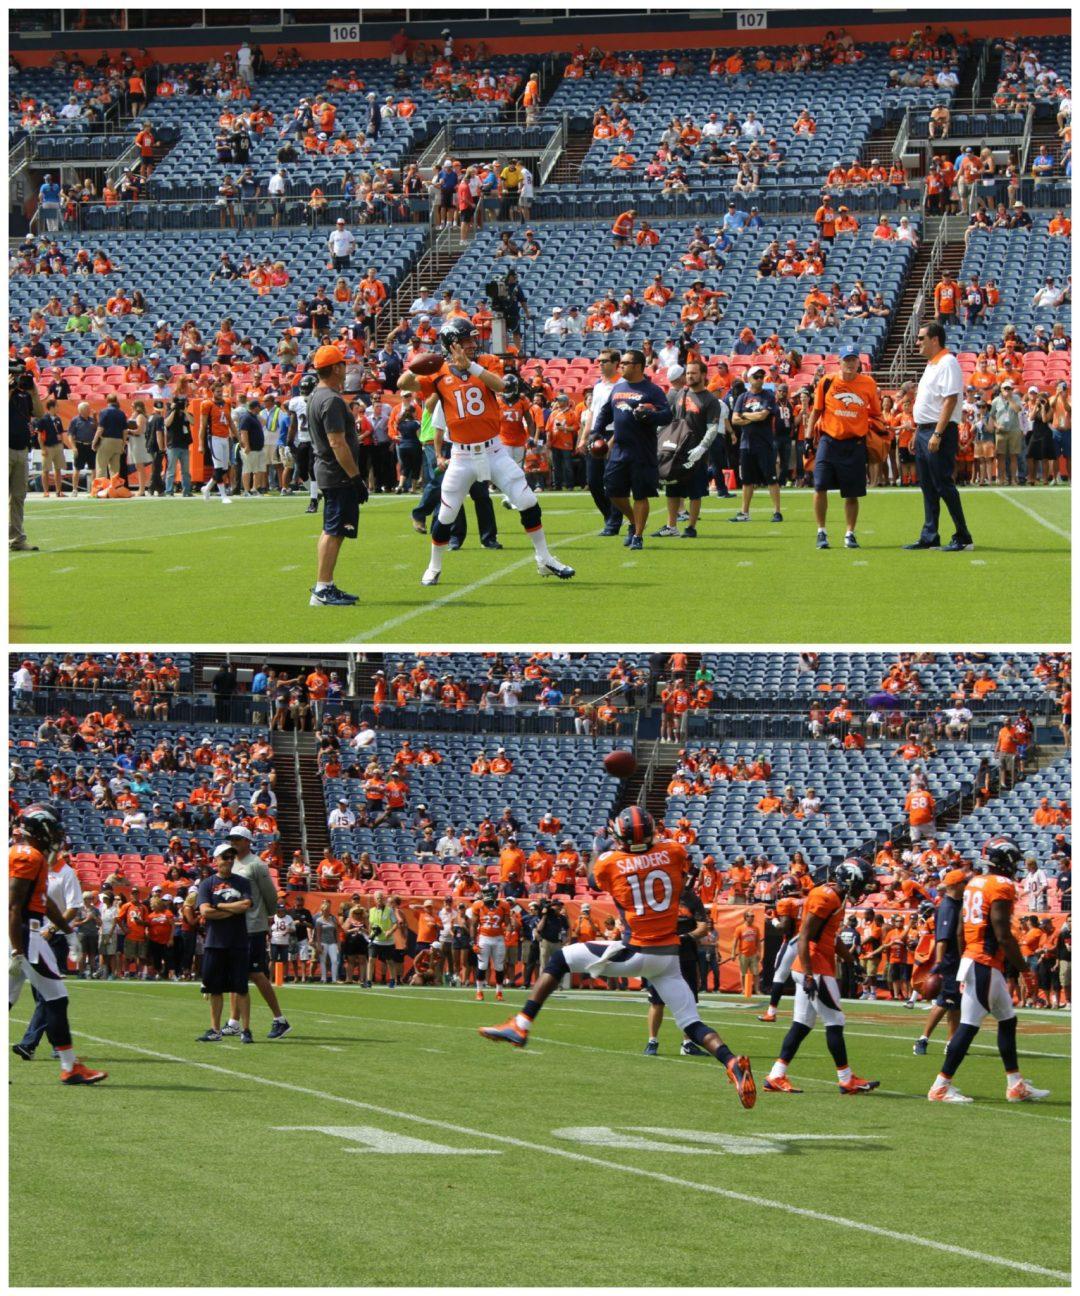 Broncos-field-photos